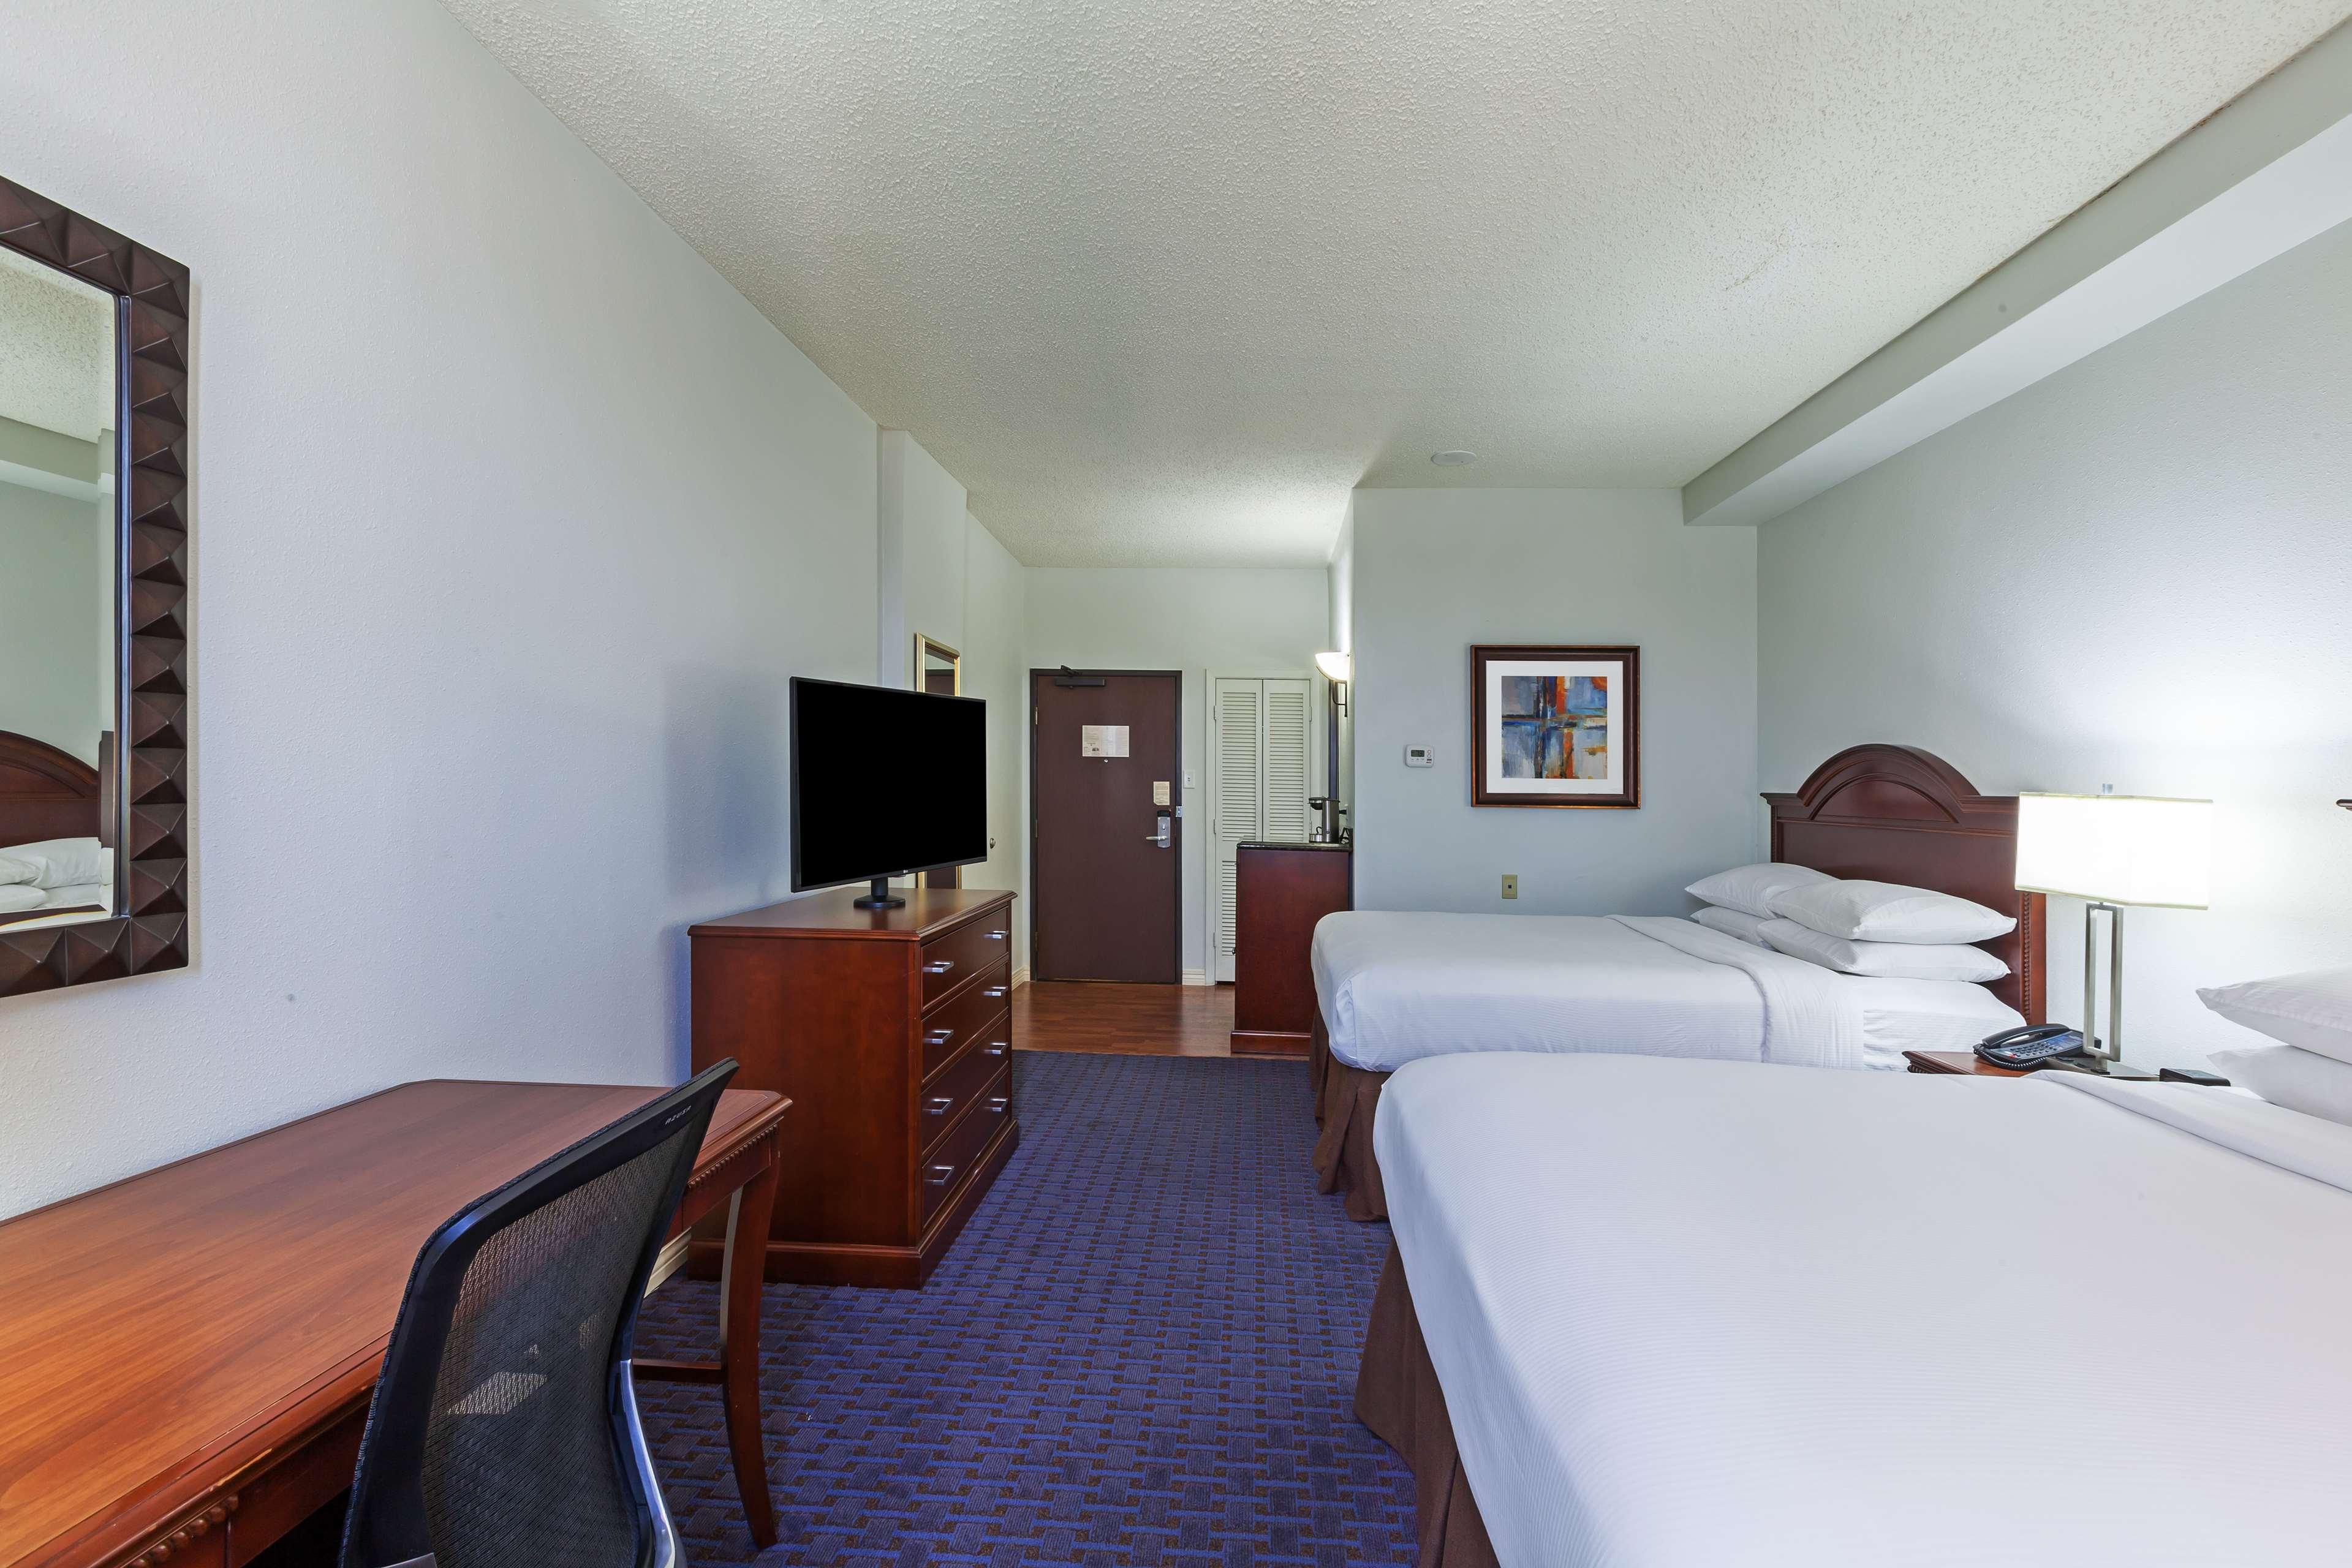 Hilton Waco image 45